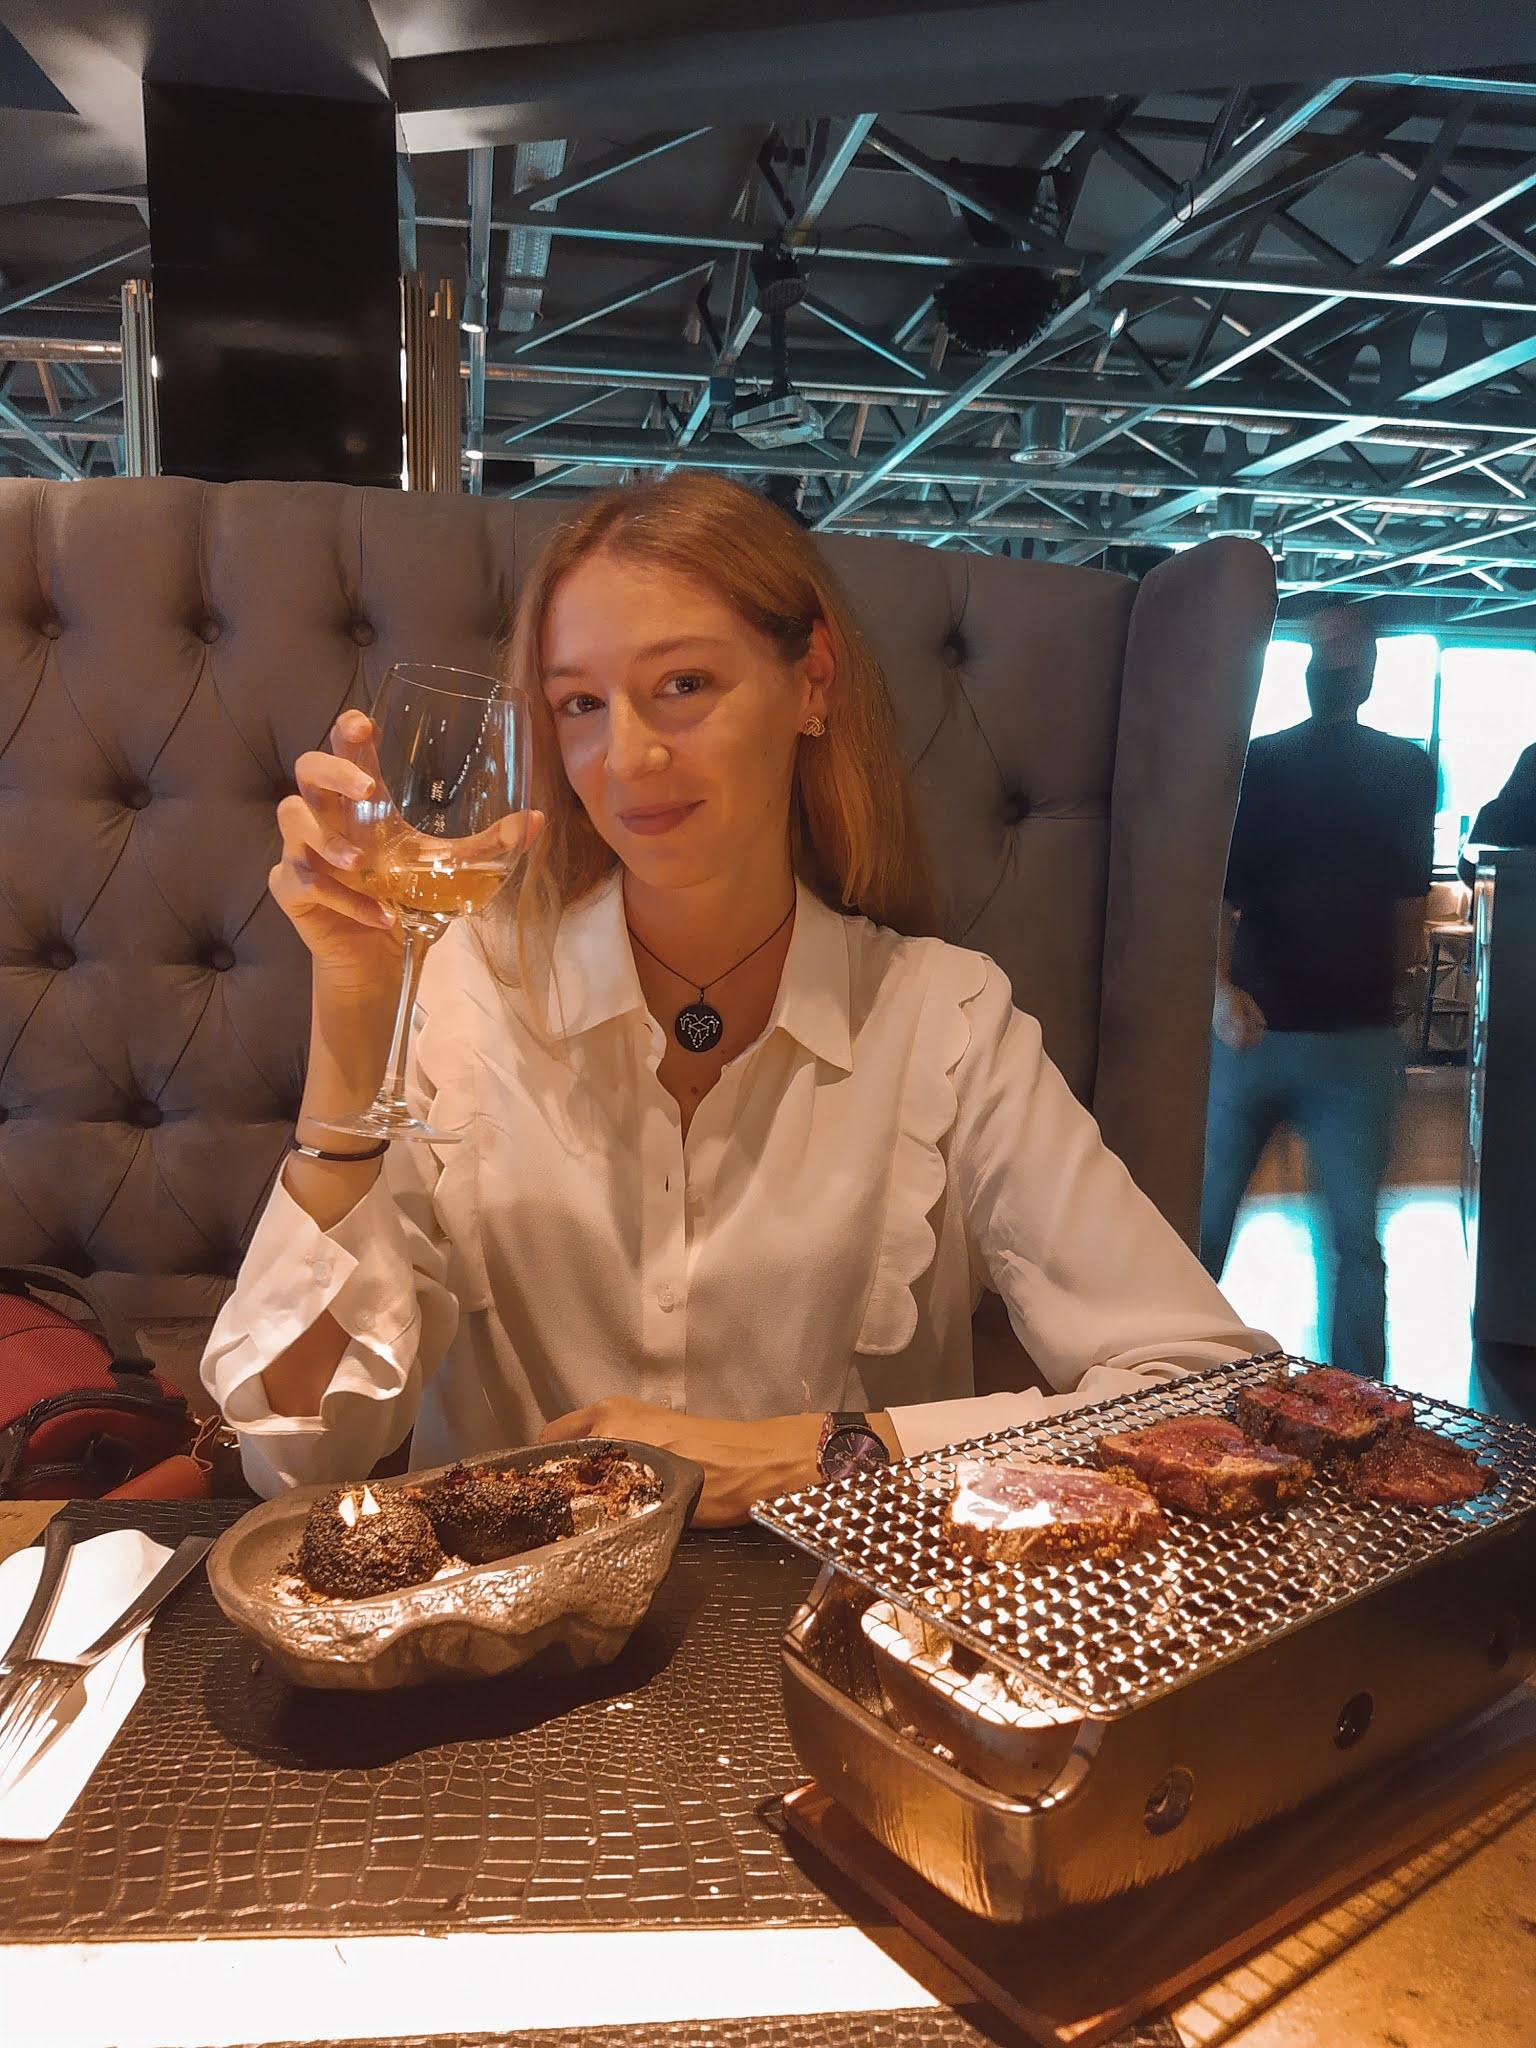 restaurante-zielou-madrid-preppyels